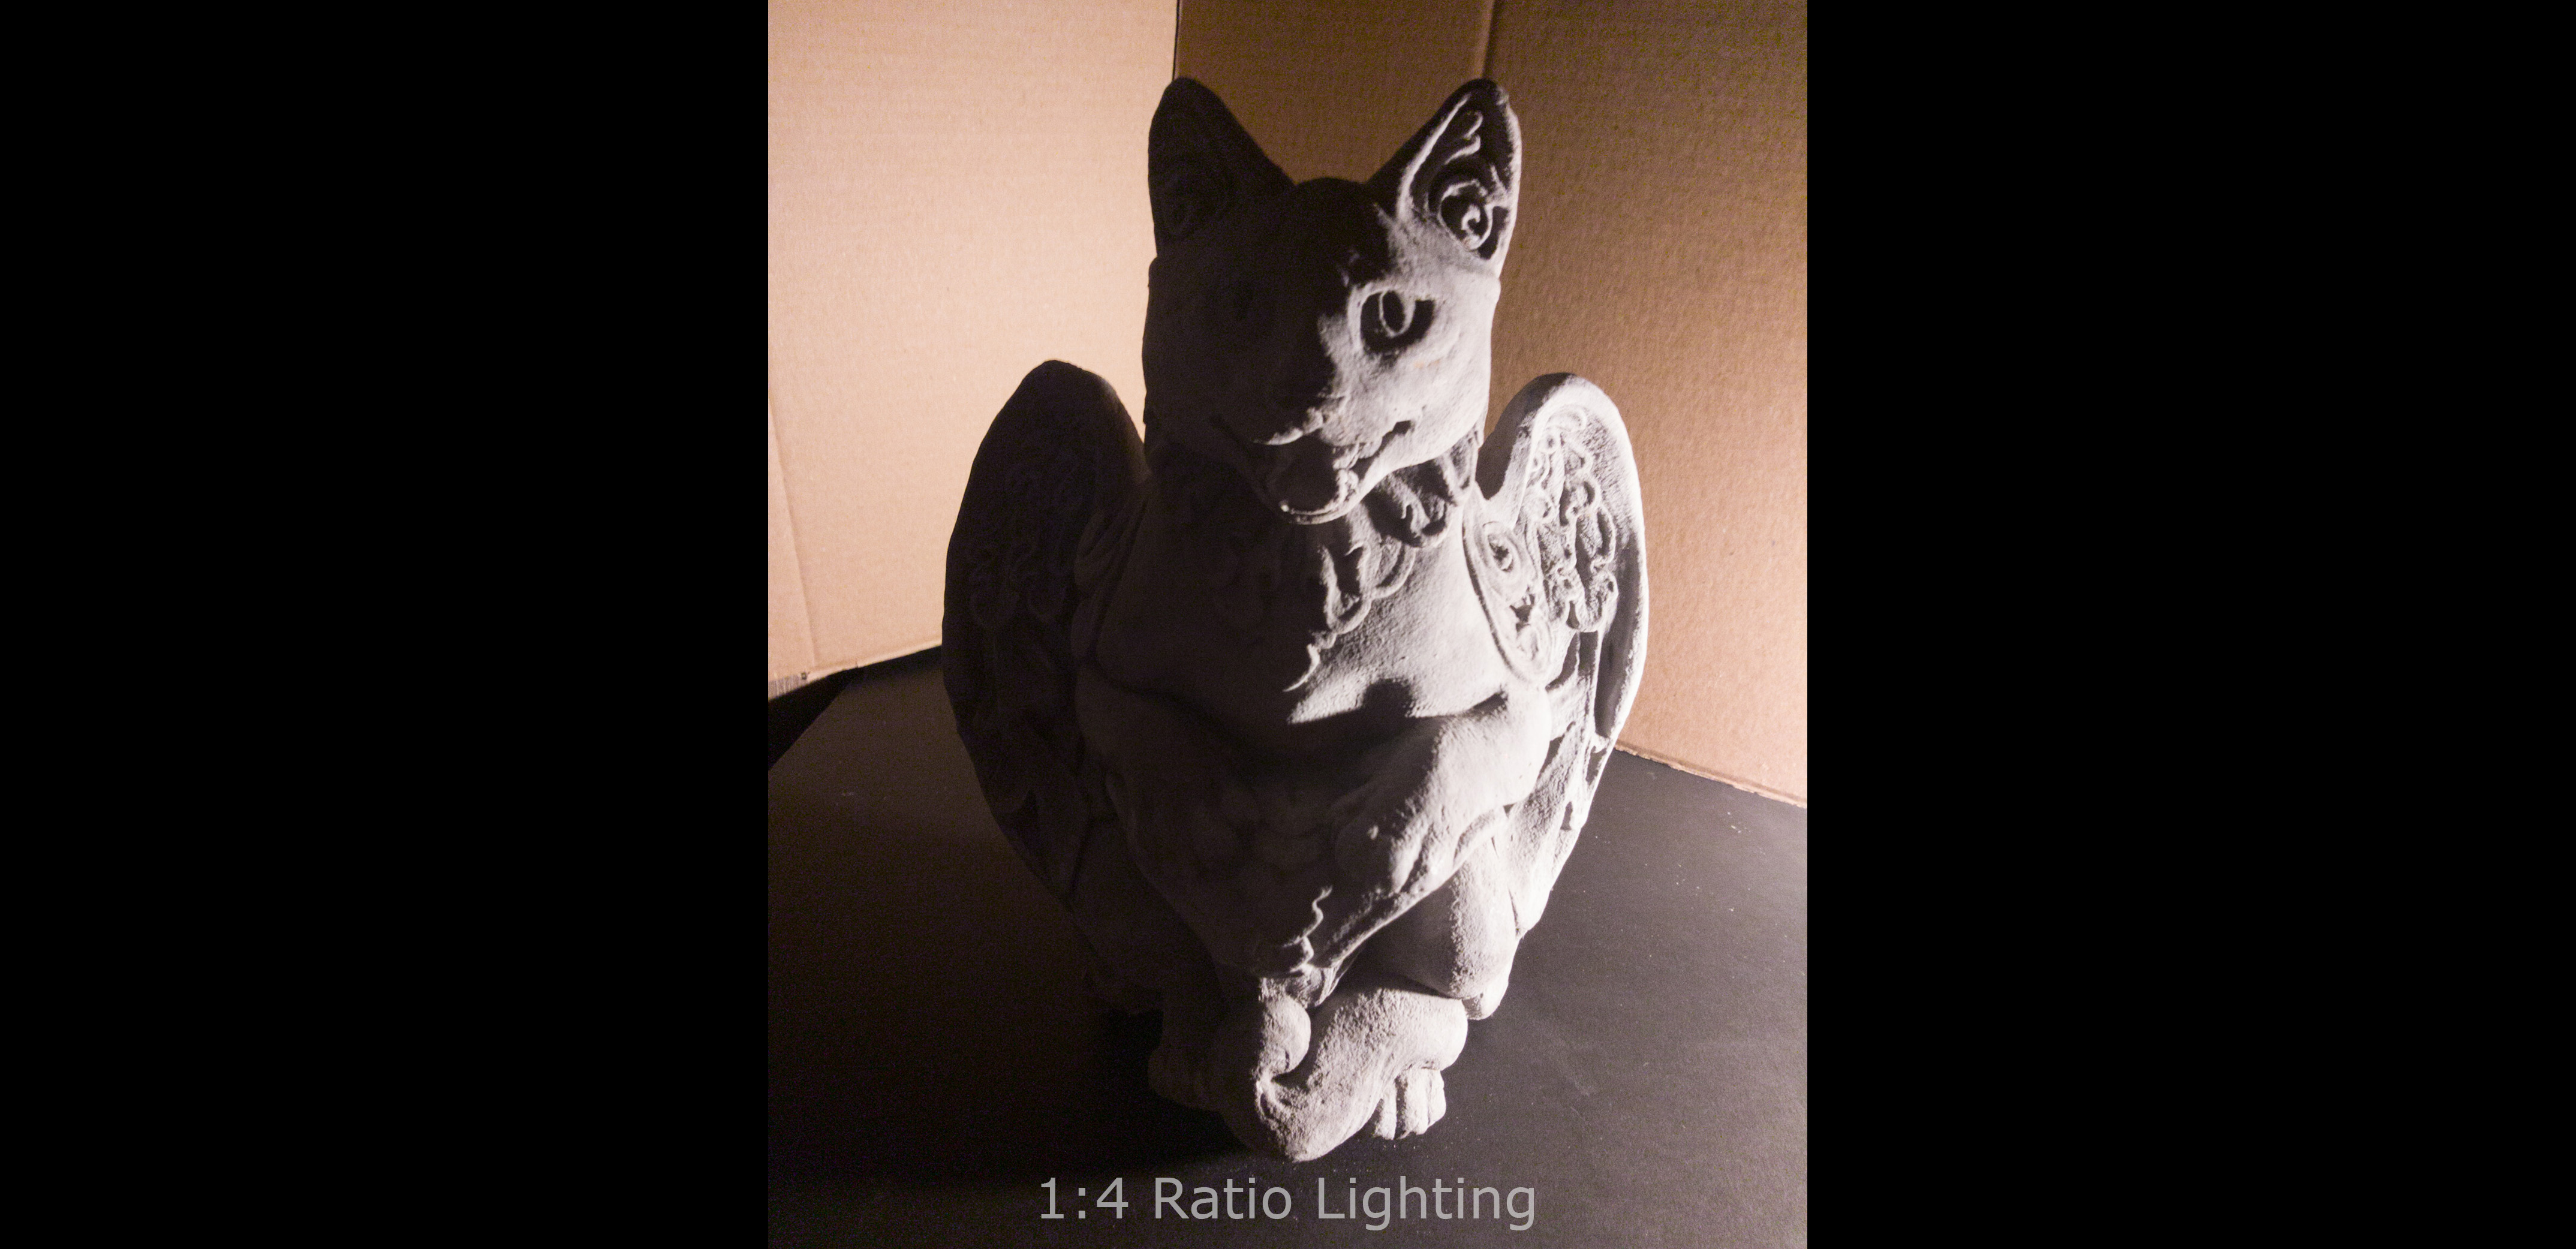 1:4 Ratio Lighting